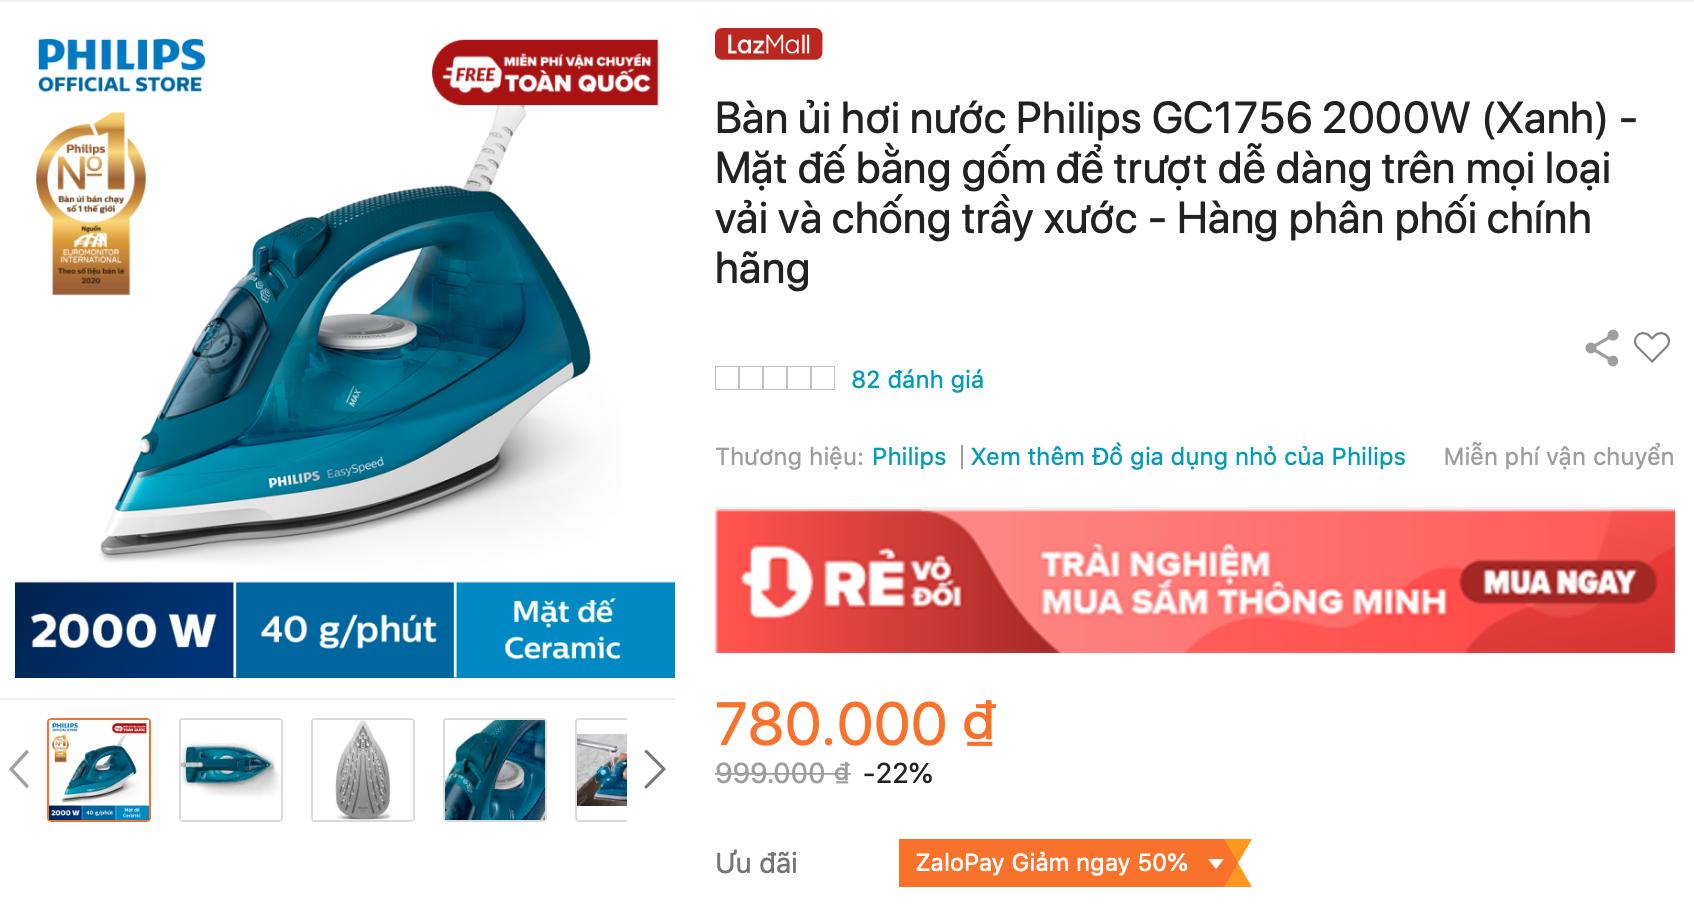 Philips GC1756